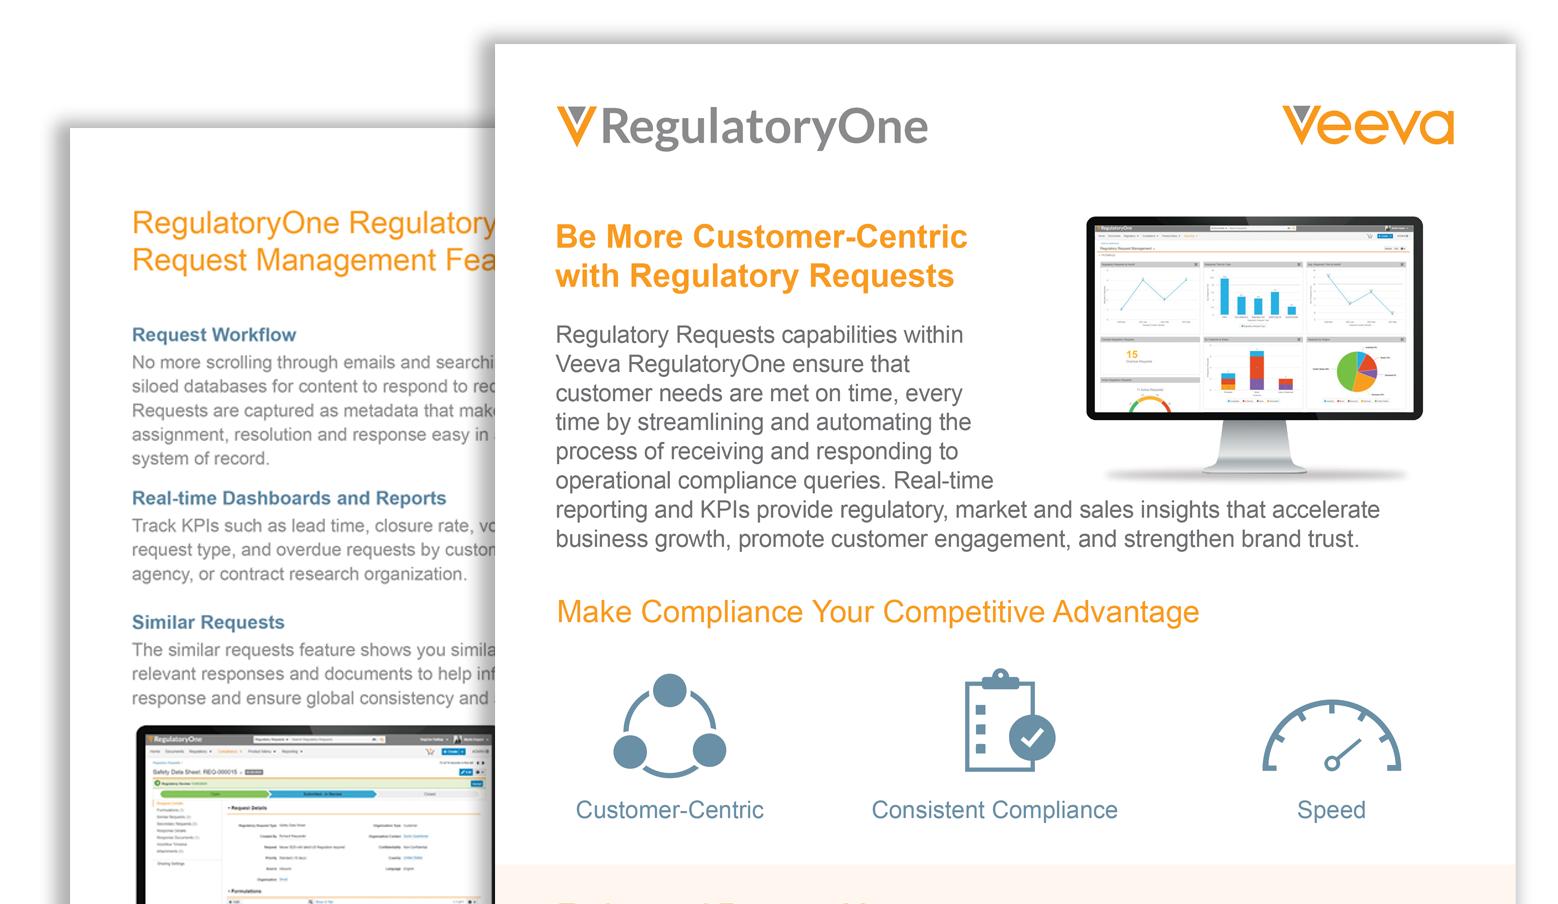 Veeva RegulatoryOne Regulatory Requests Management Product Brief